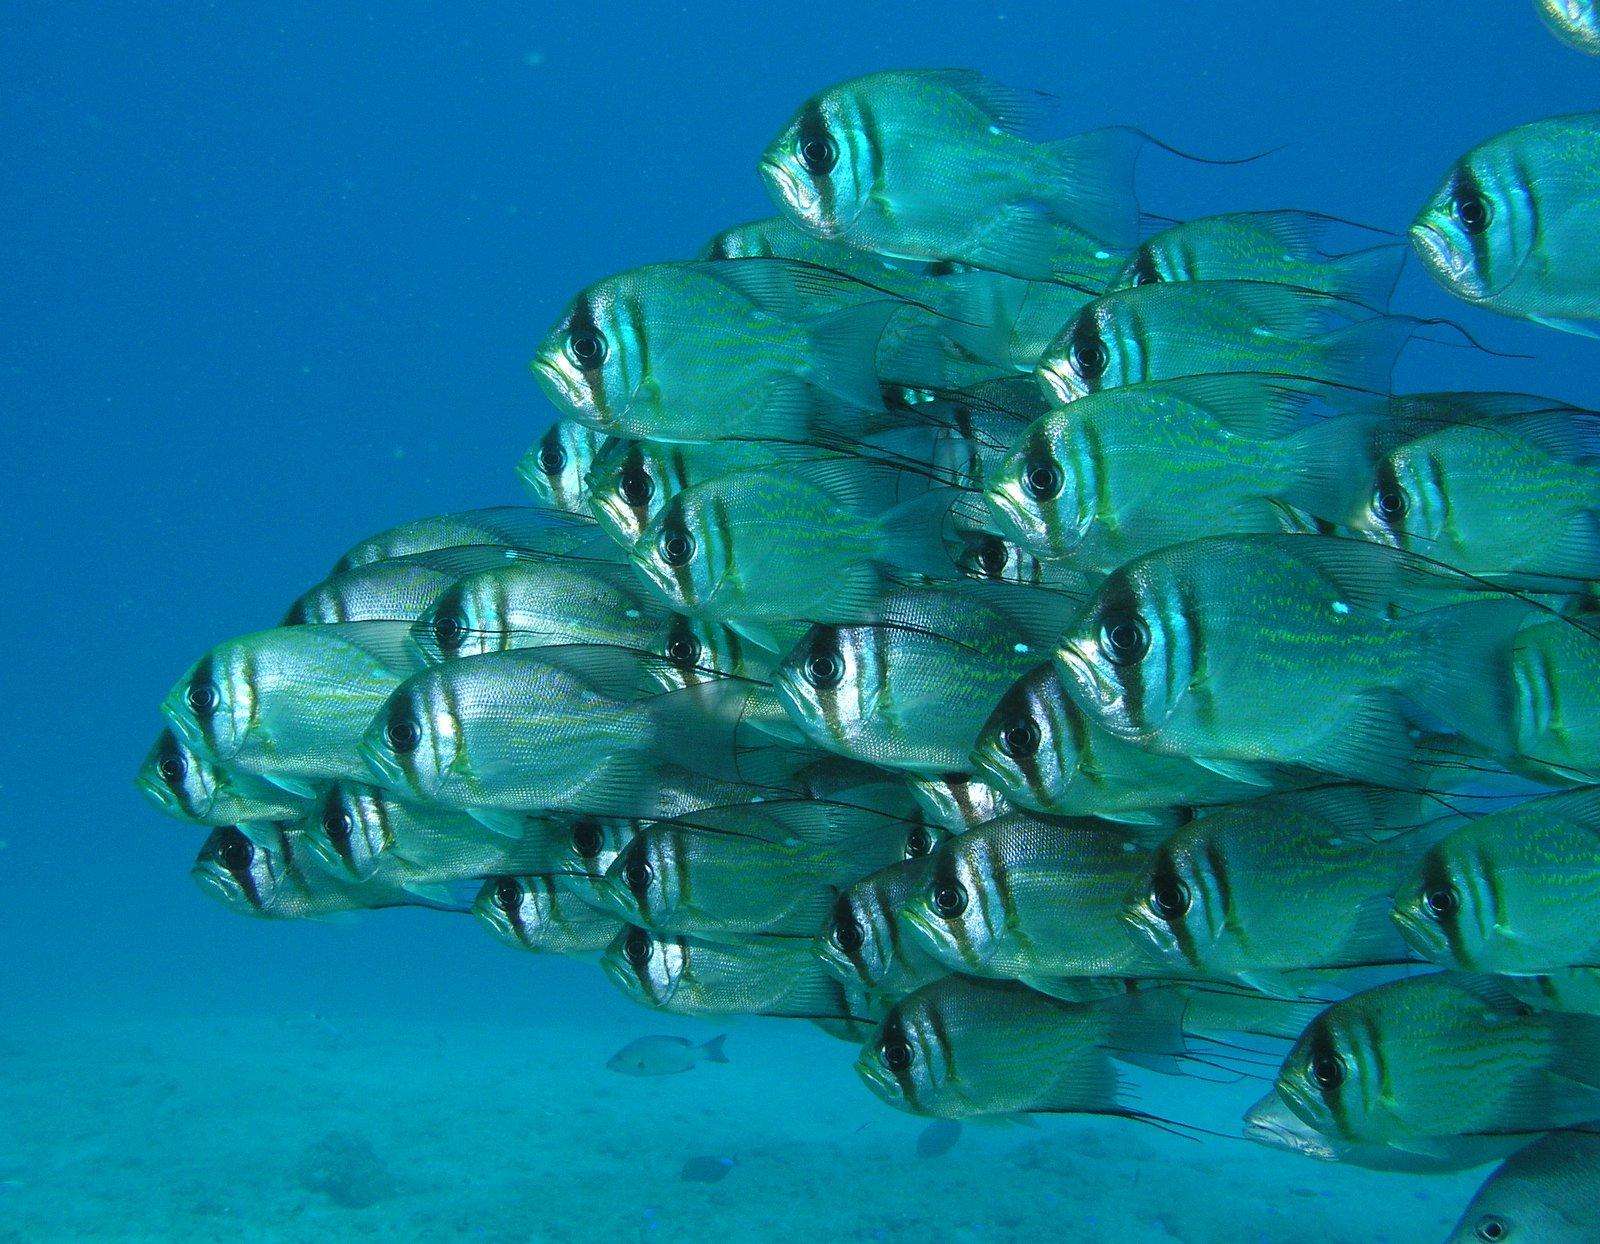 Threadfin Pearl Perch, Glaucosoma magnificum